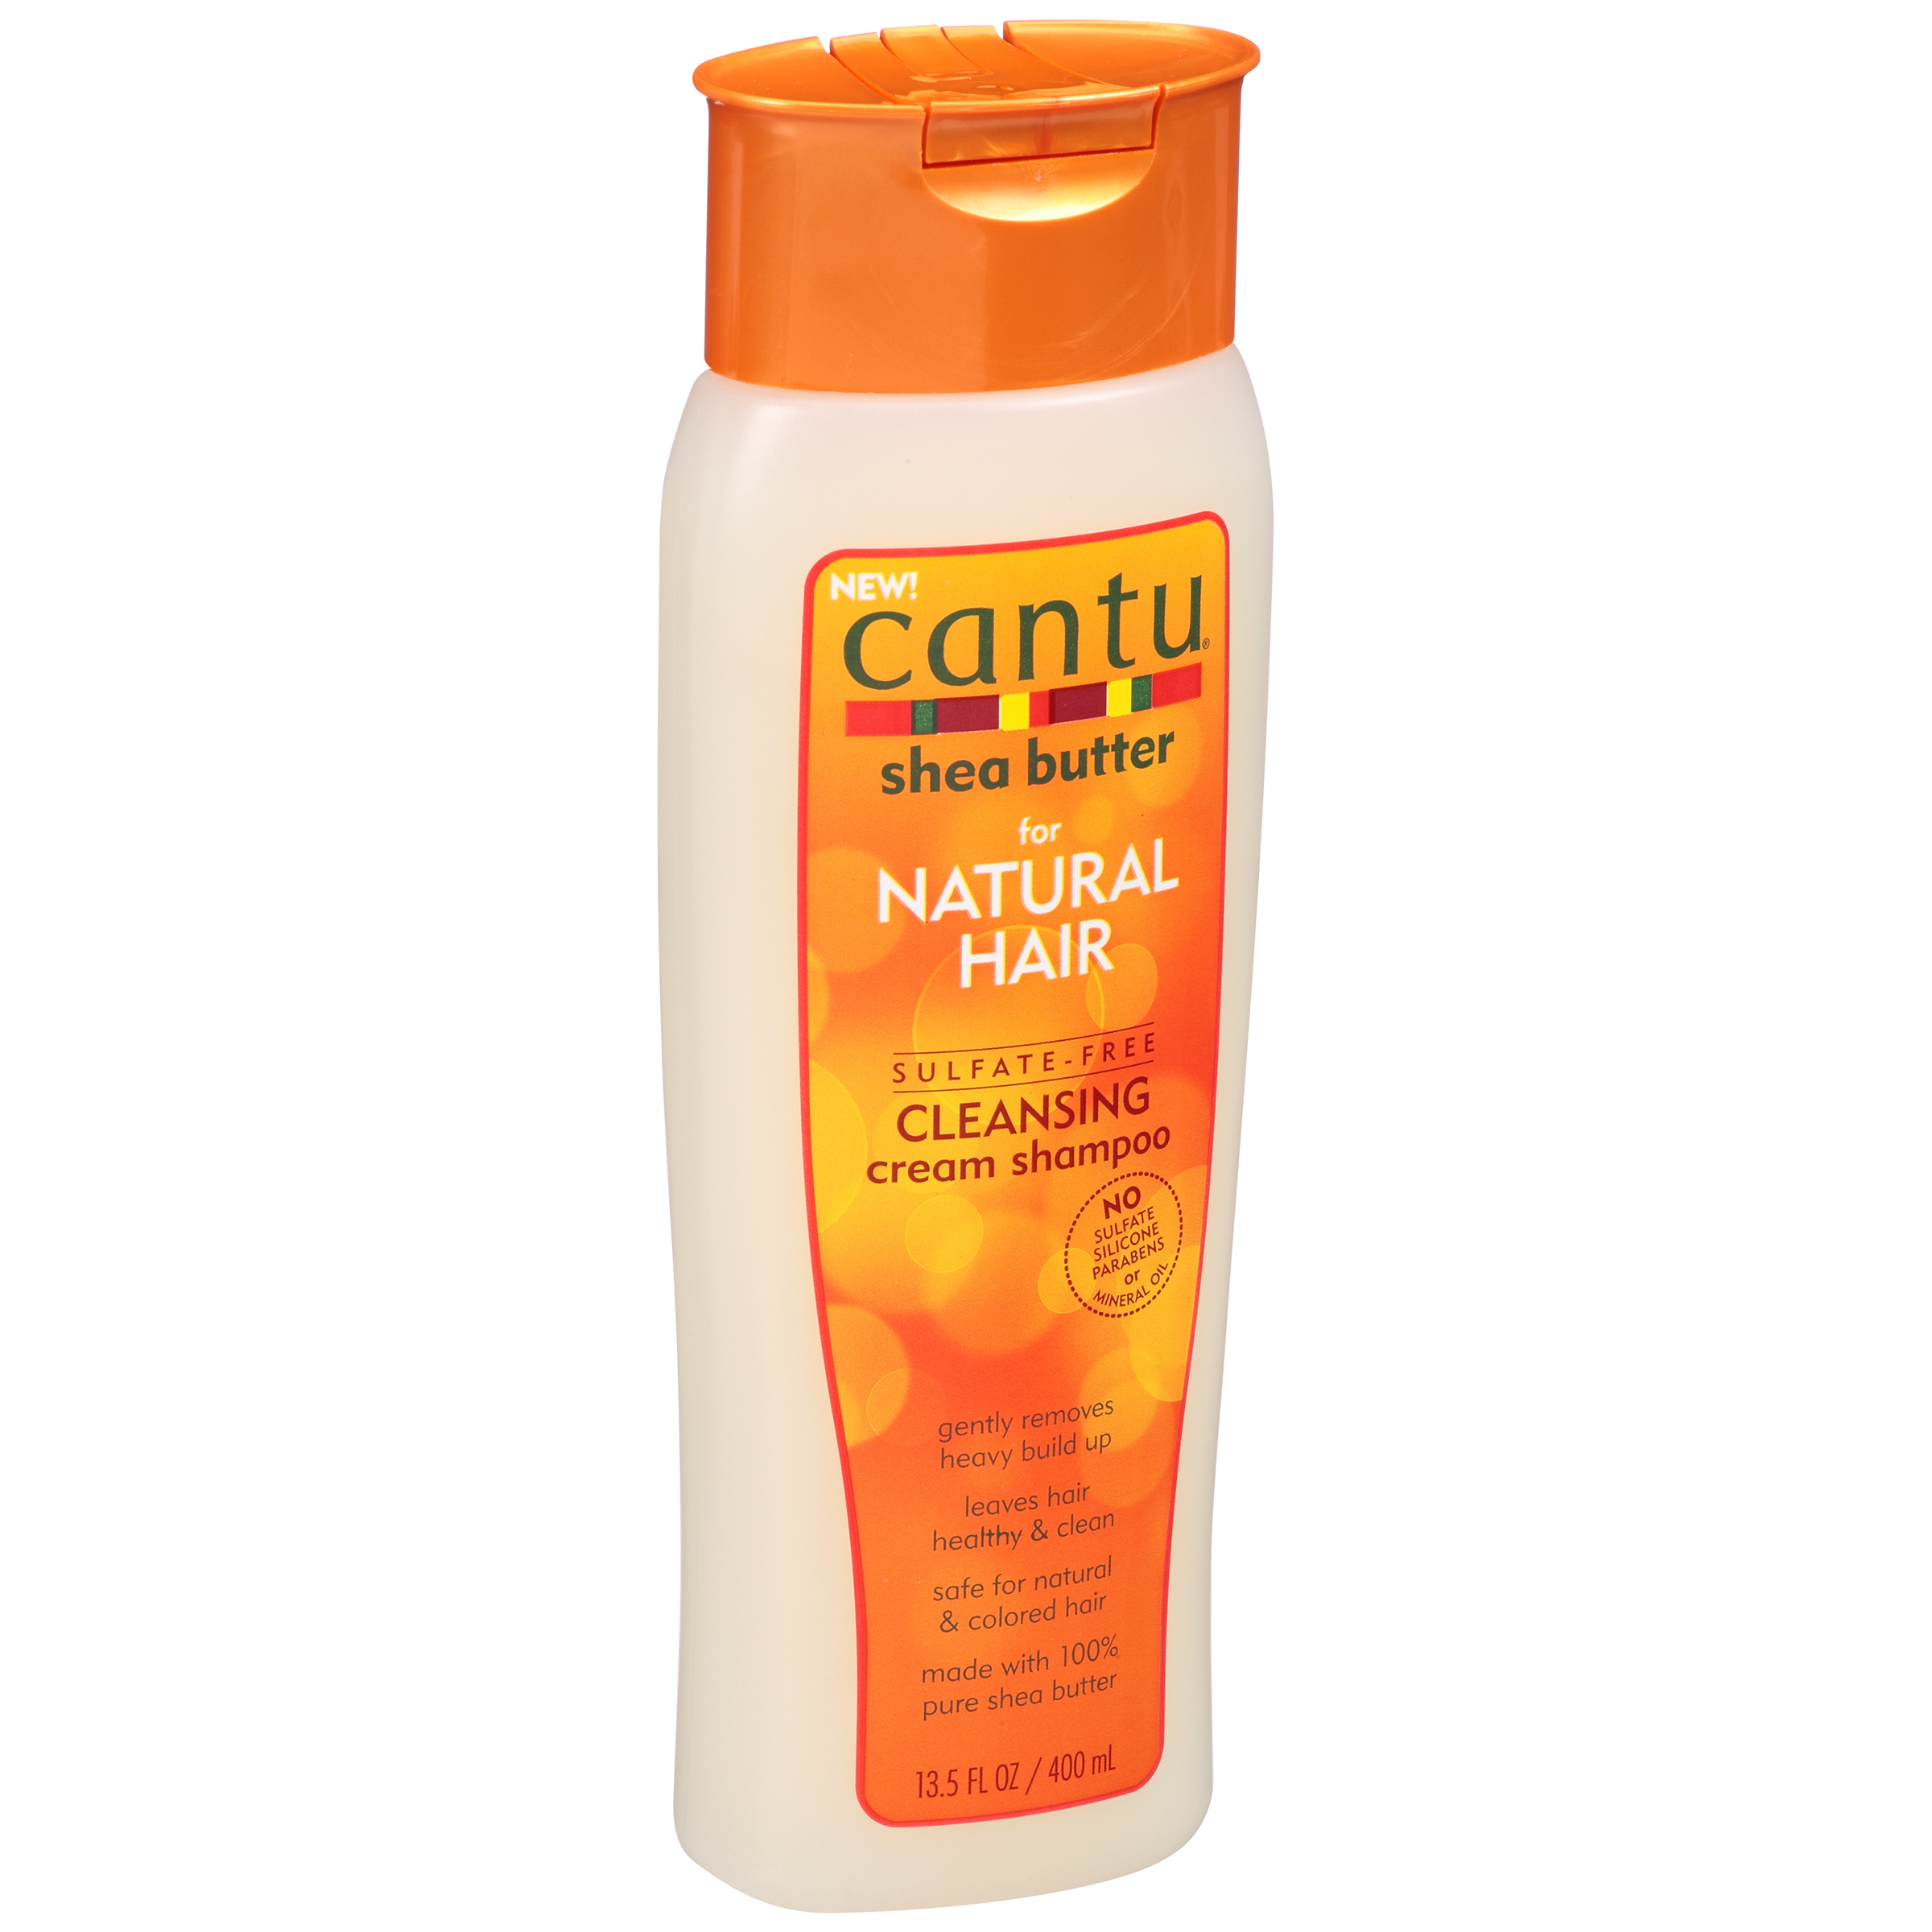 c9b91d524598 Cantu Shea Butter for Natural Define & Shine Custard,12 oz - Walmart.com